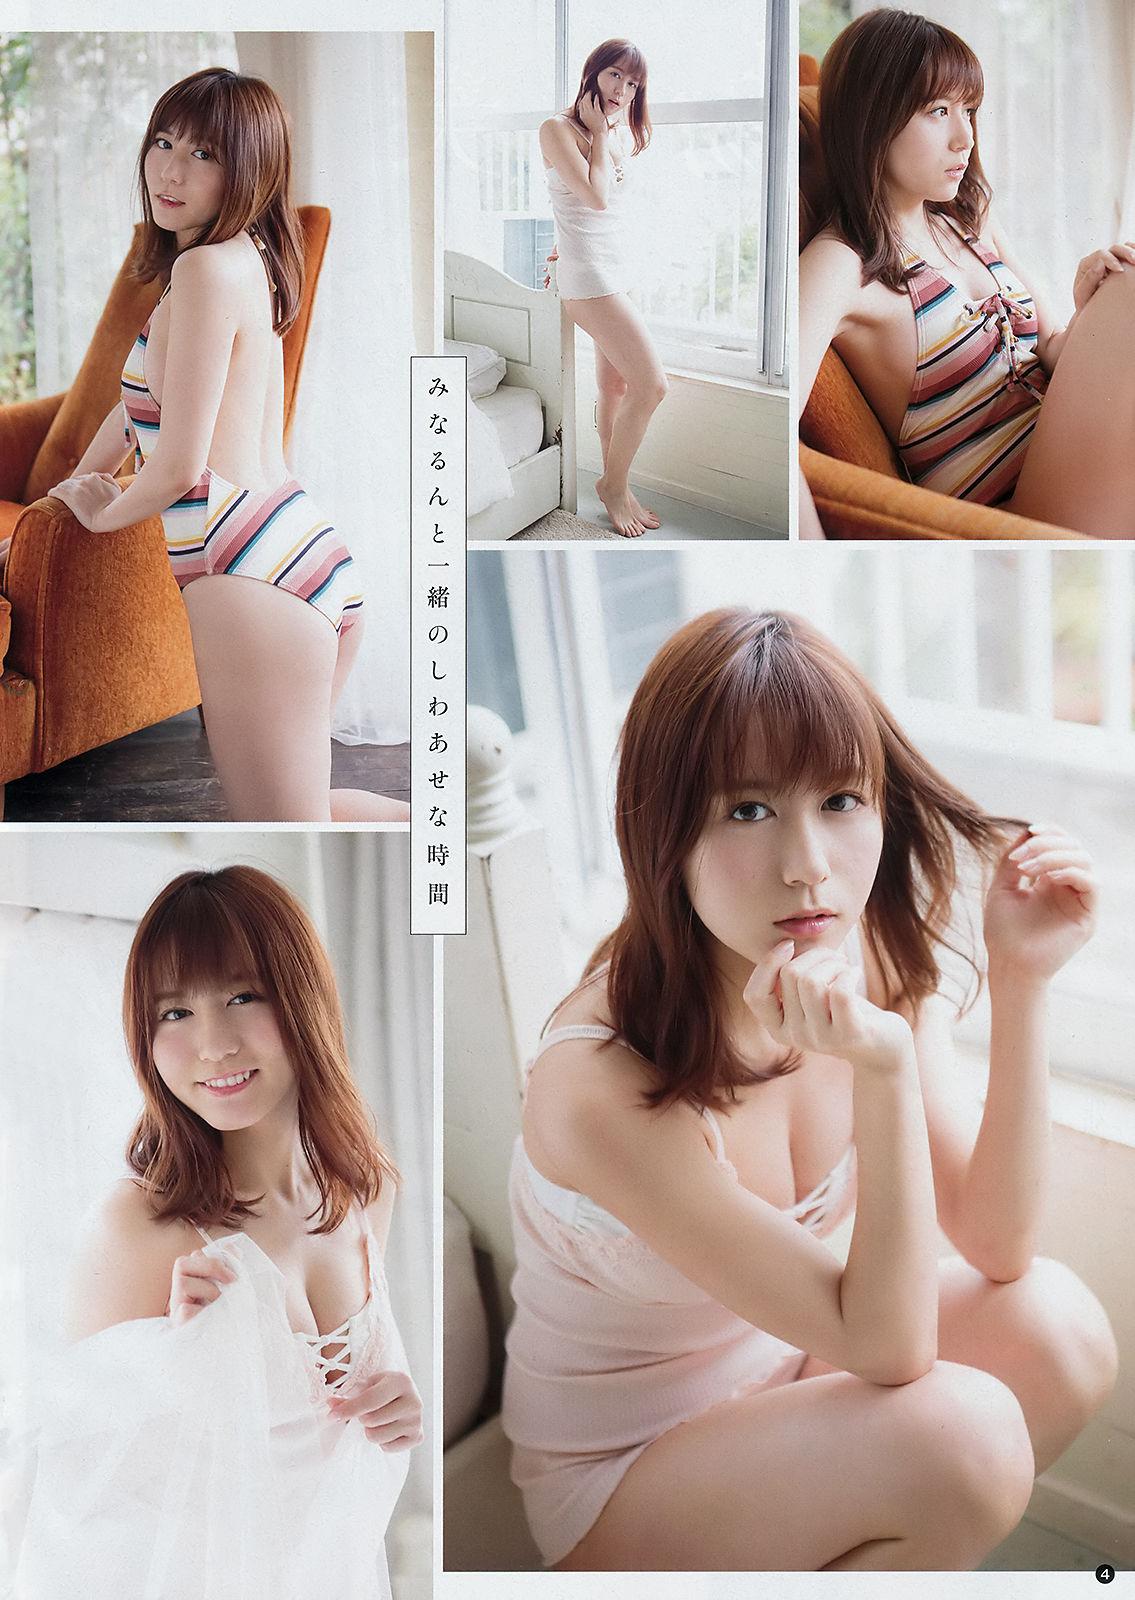 VOL.408 [Young Champion]日本嫩模:大场美奈(大場美奈)超高清写真套图(9P)